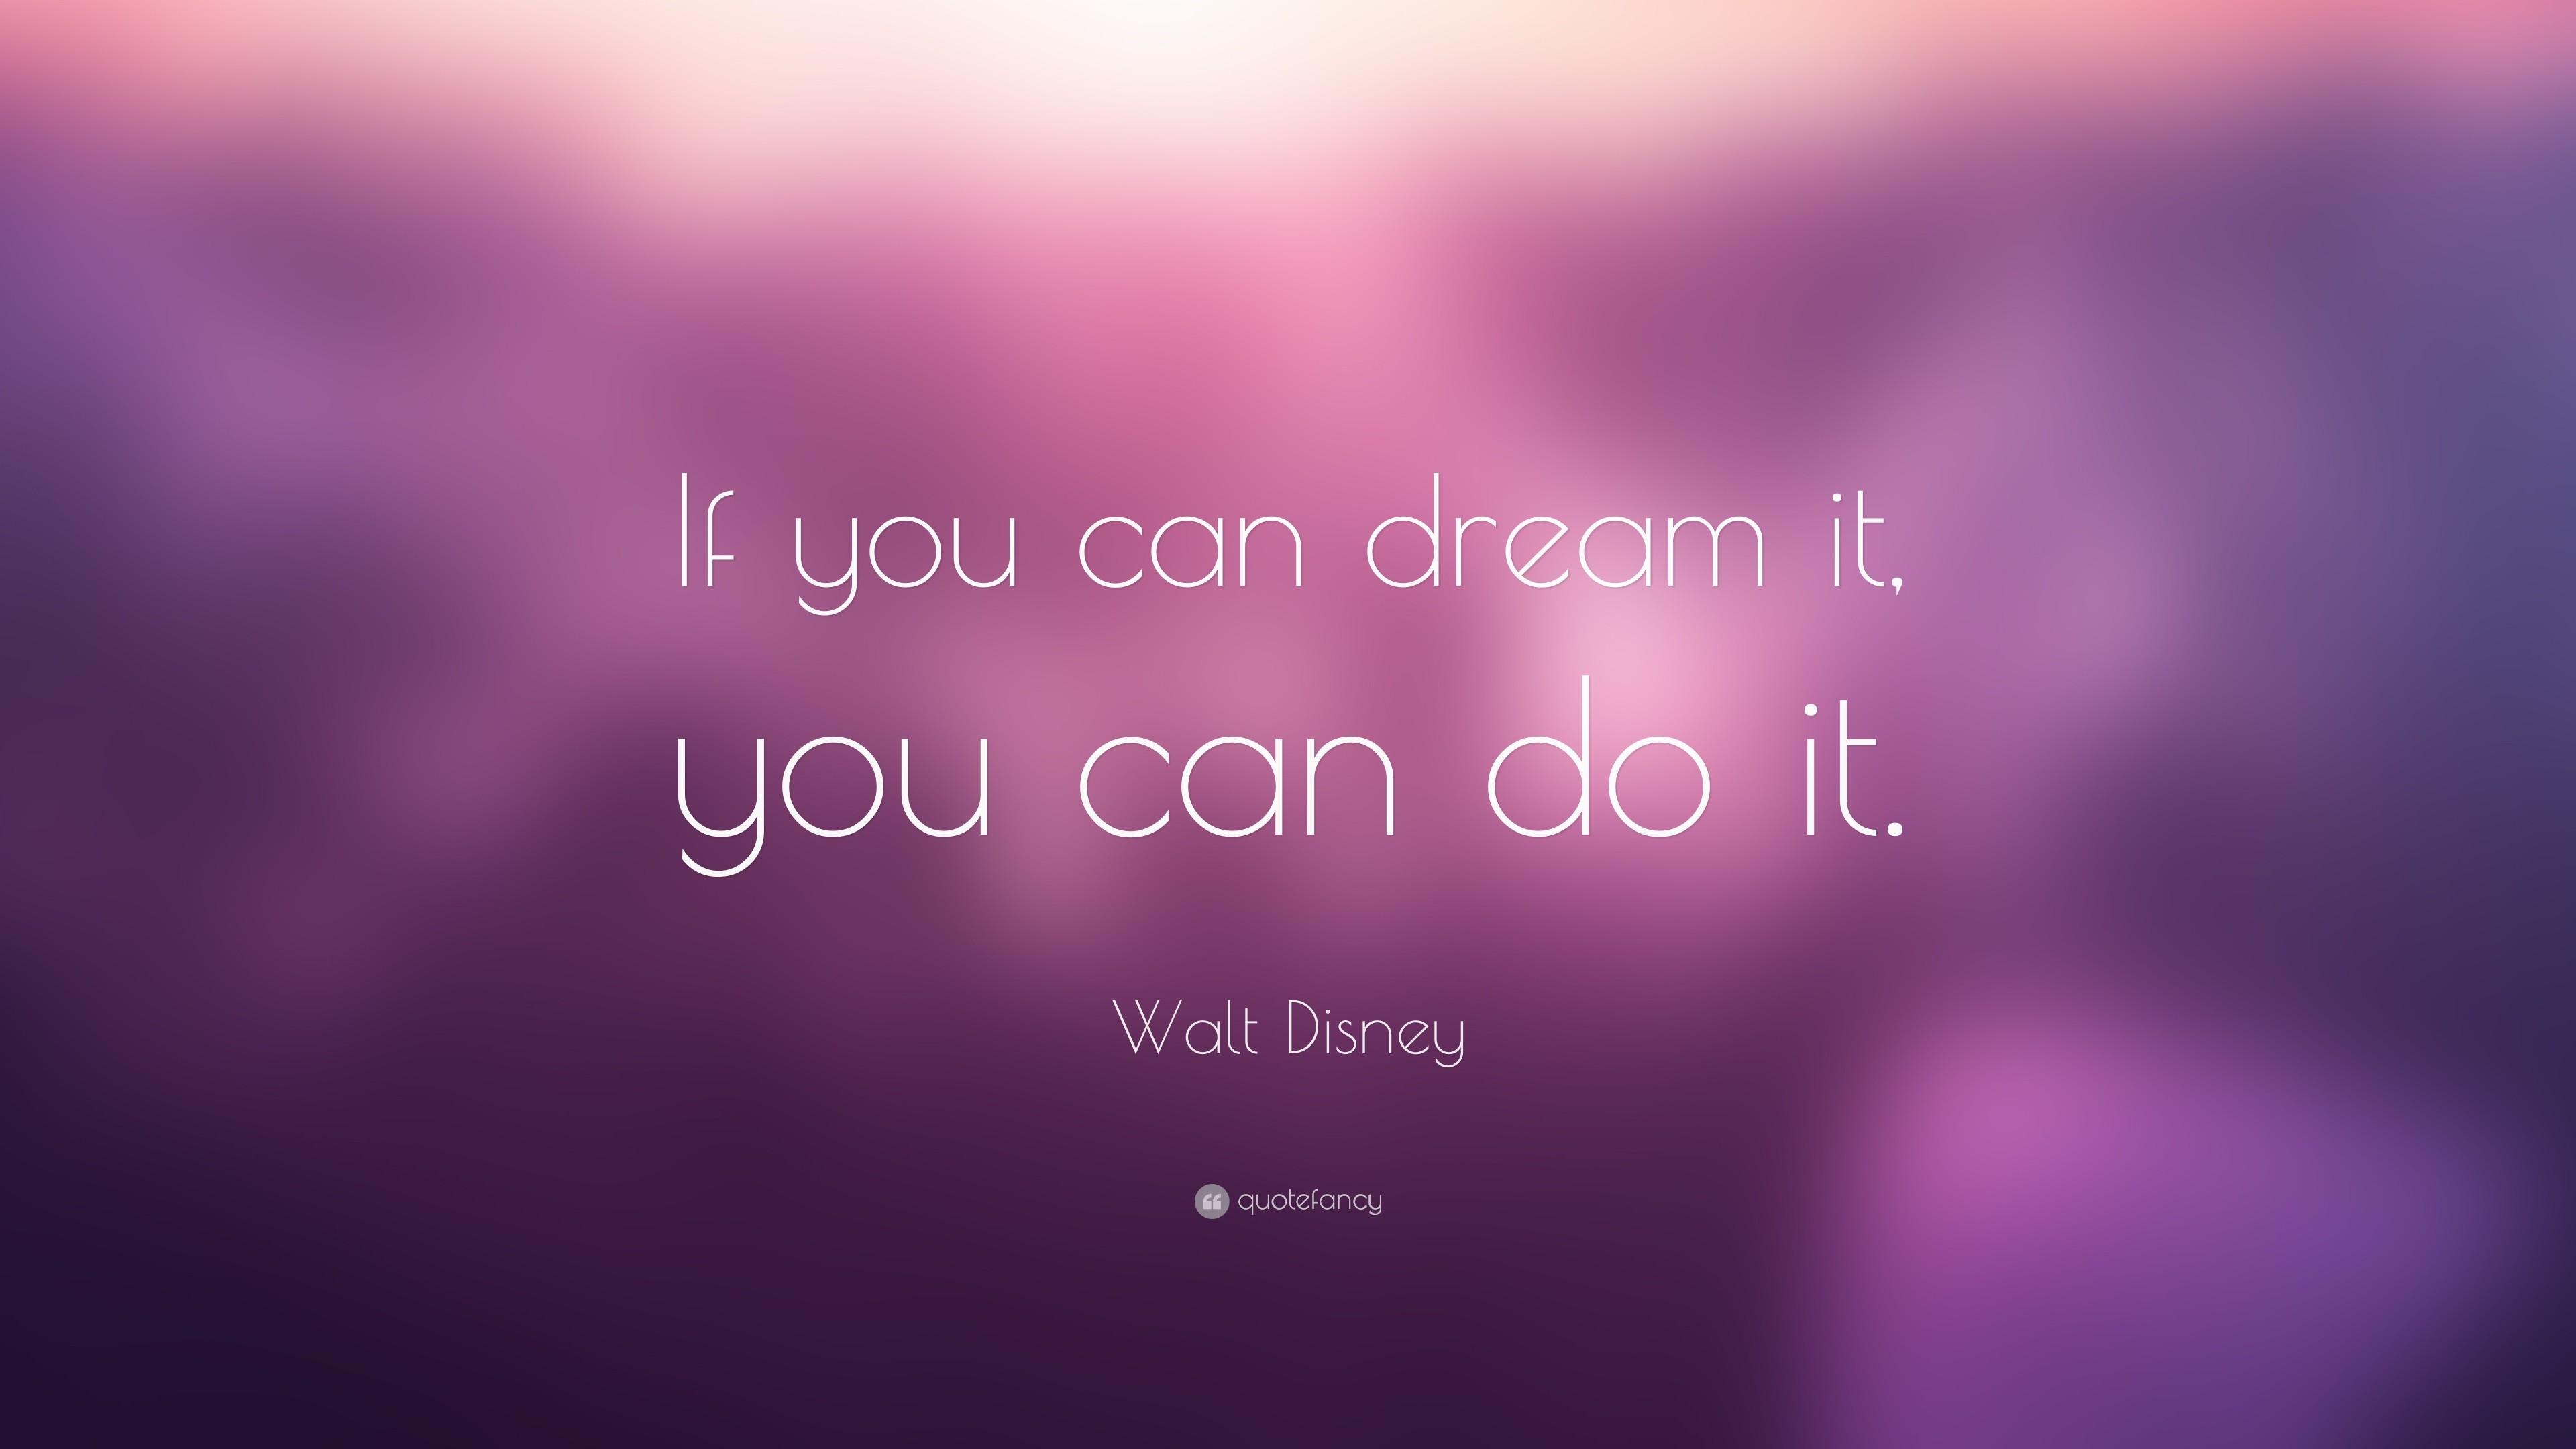 Motivational Wallpapers Dream